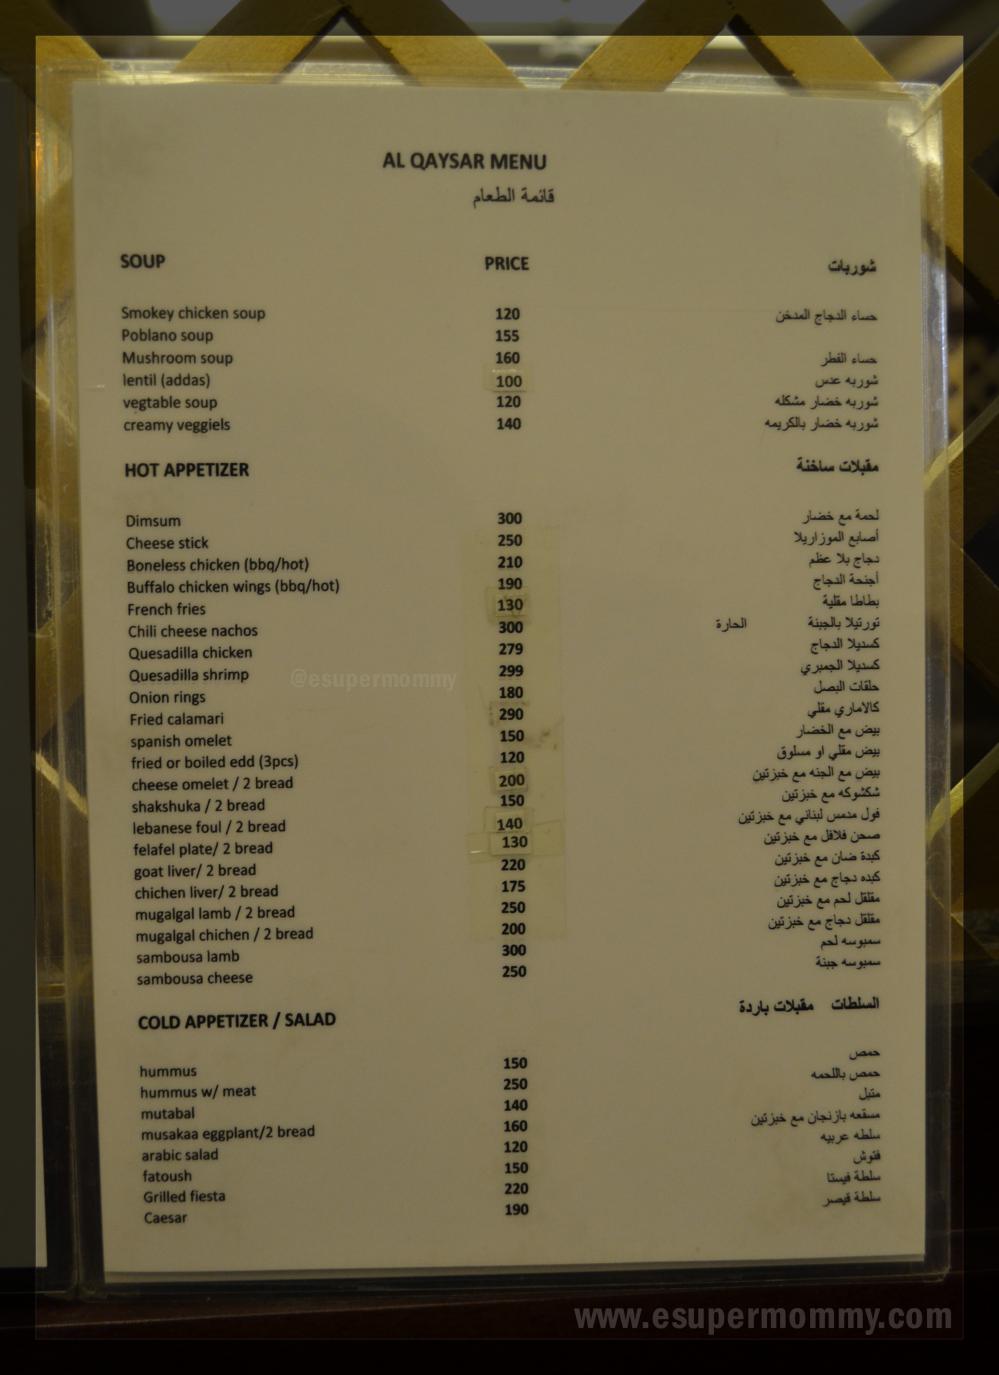 Al-Qaysar-appetizer-price-list